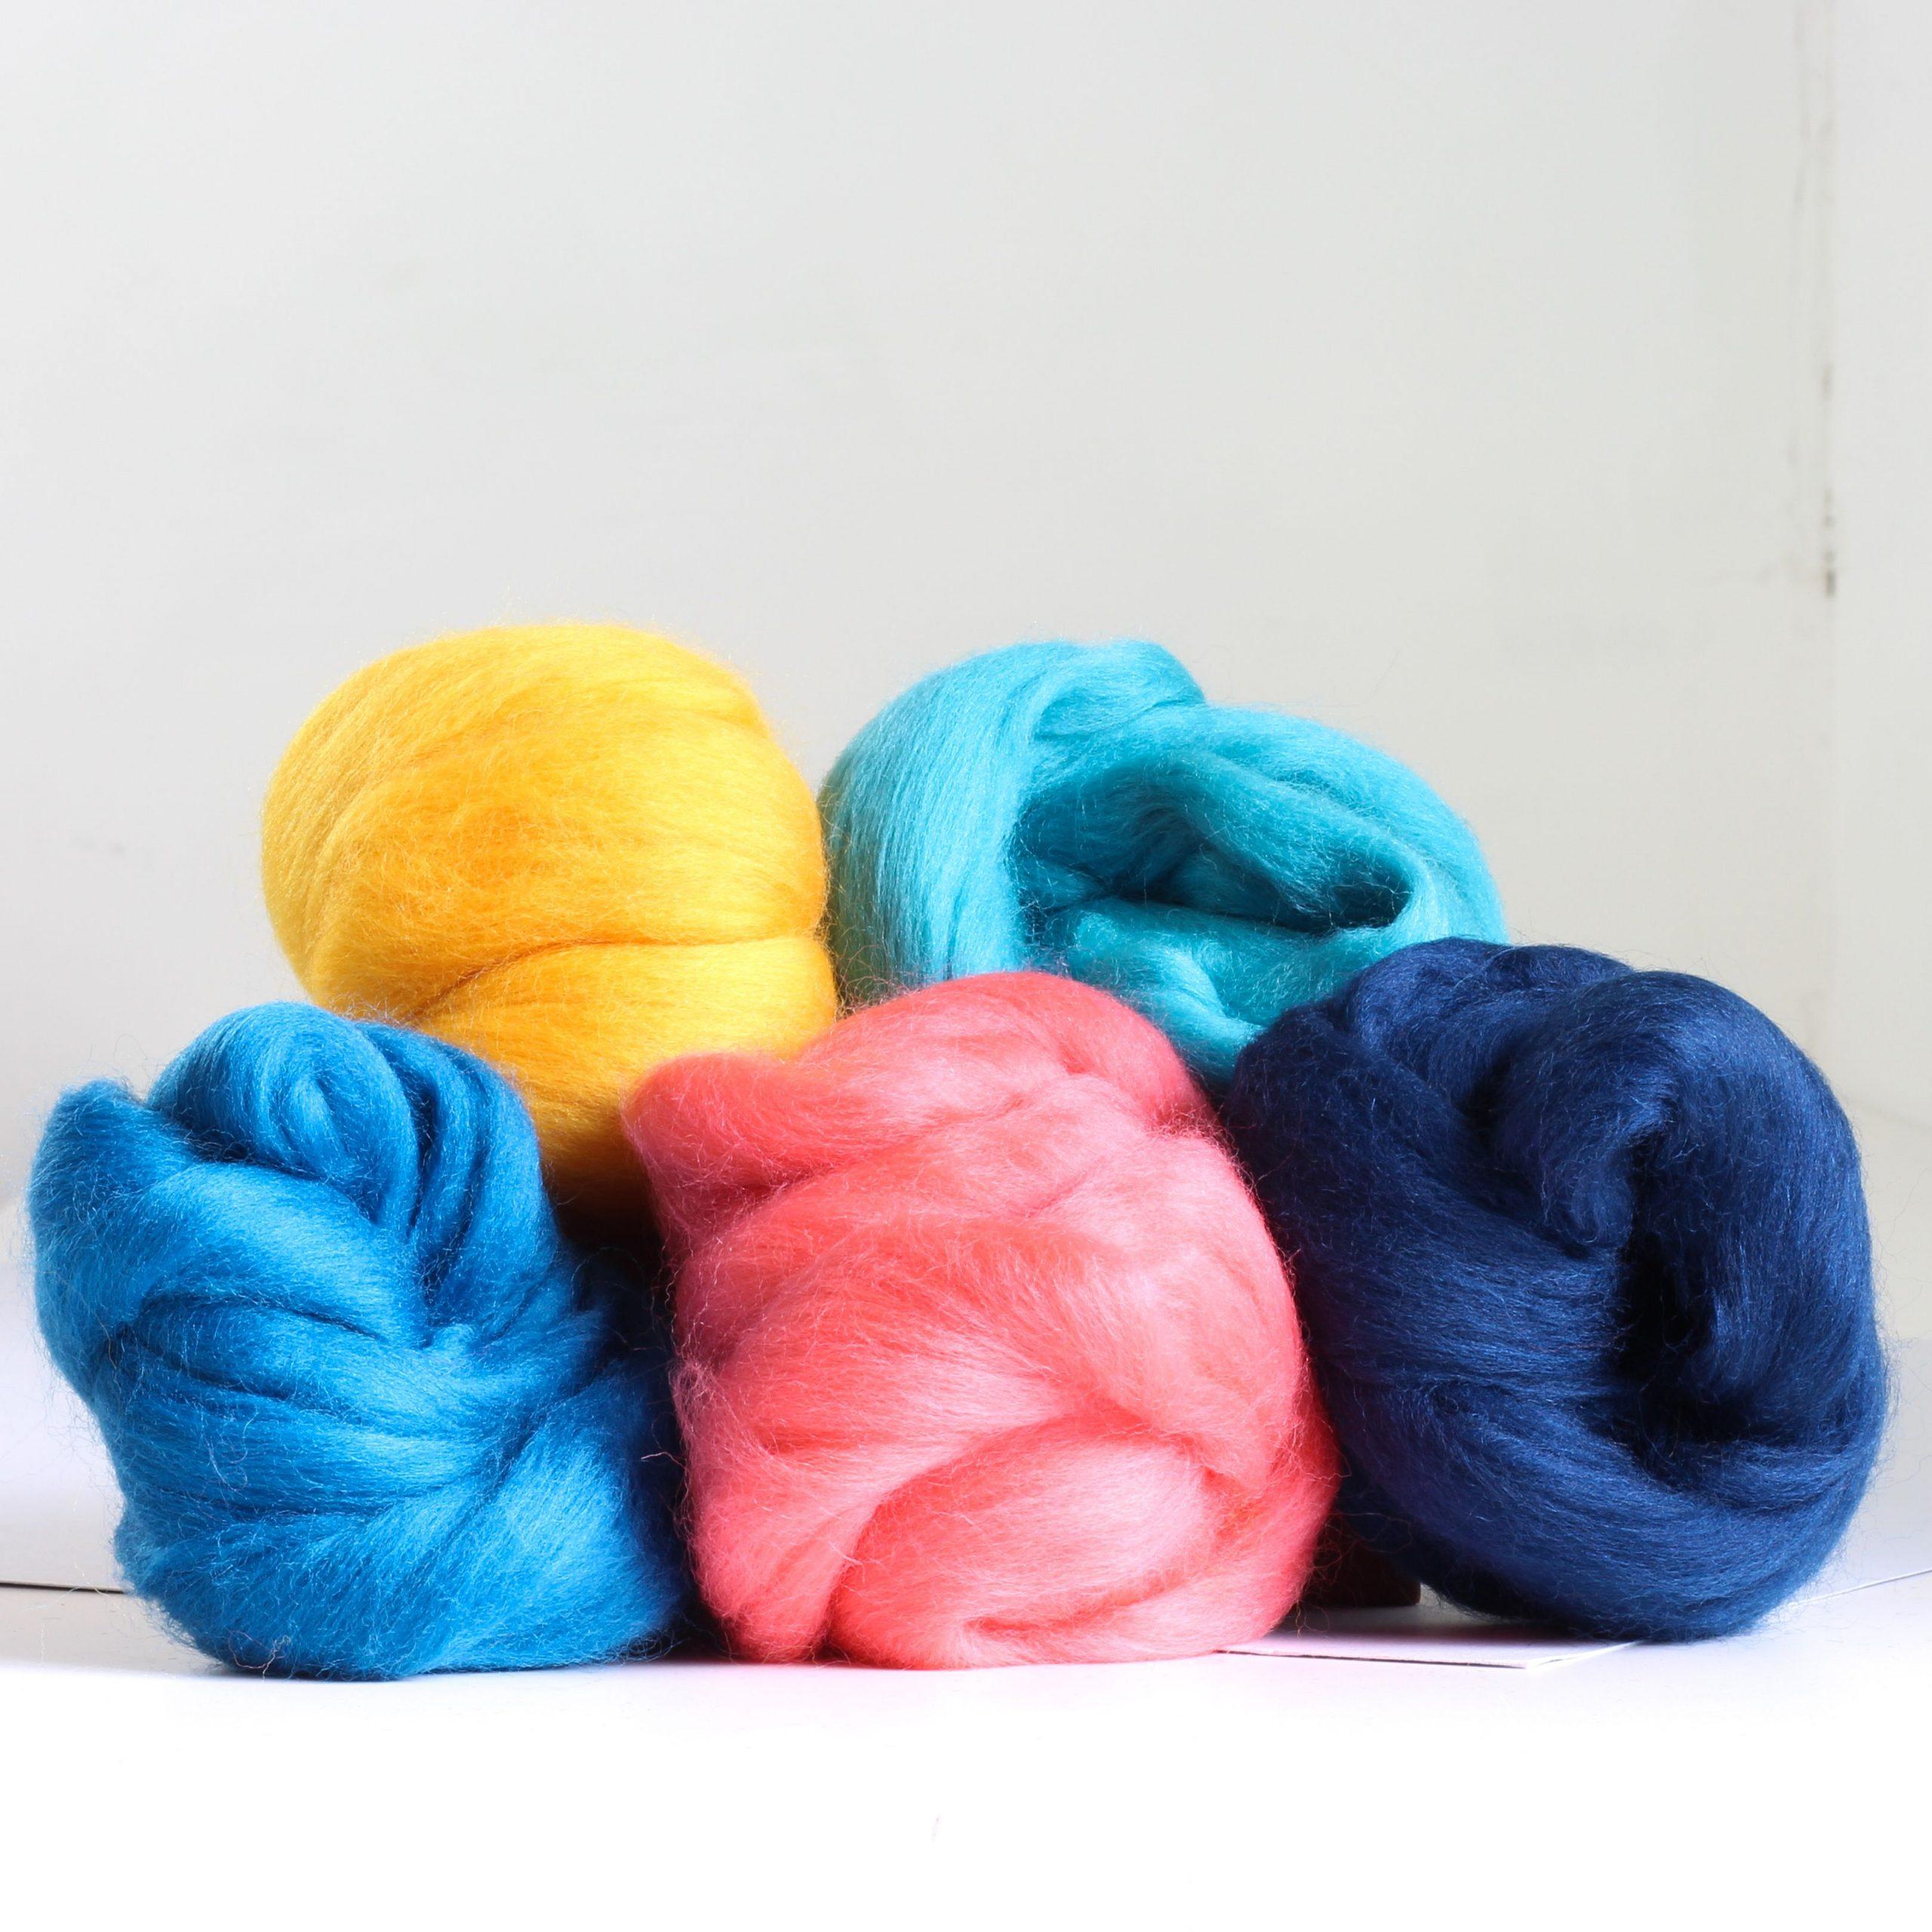 Hawthorn Handmade Needle Felting Merino Wool - Ocean